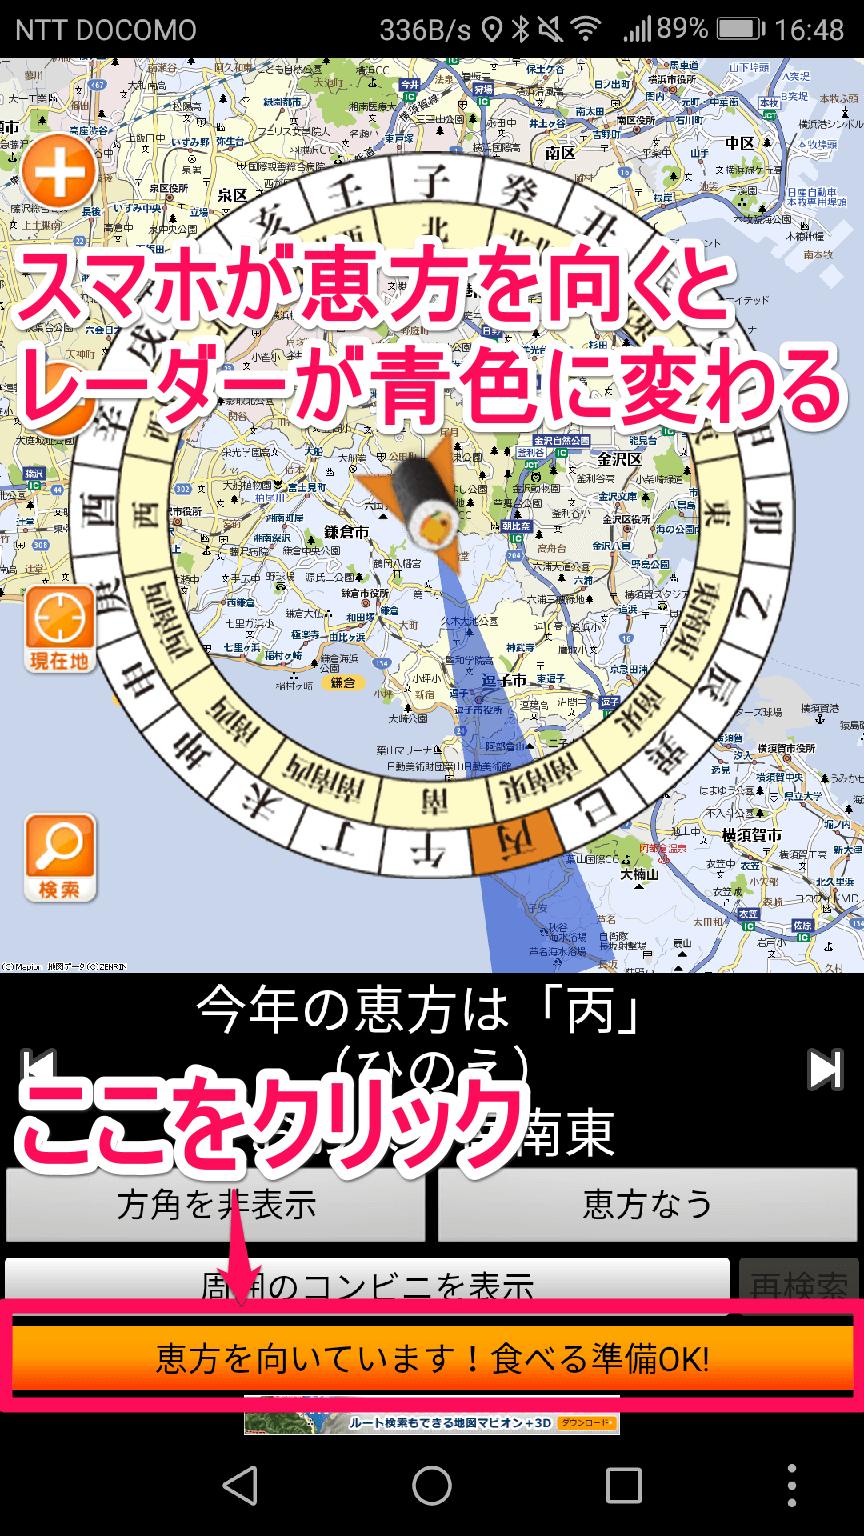 Android(アンドロイド)版&iPhone(アイフォーン)版「恵方マピオン」が恵方の方角を示した画面